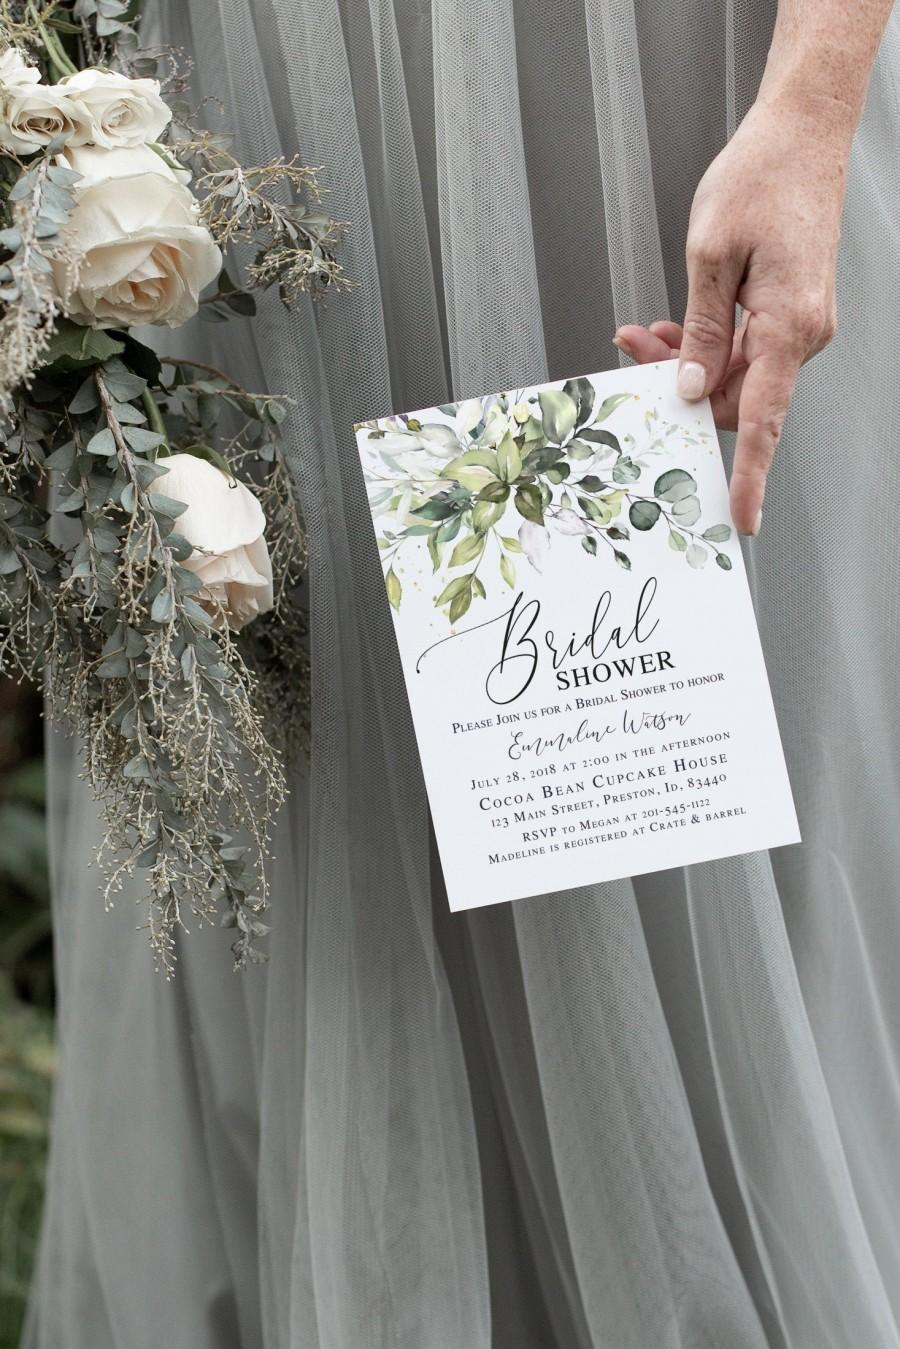 Wedding - Greenery Bridal Shower Invitation, Bridal Shower Invite Template, Instant Download DIY Printable Editable Wedding Card  LDC-HER